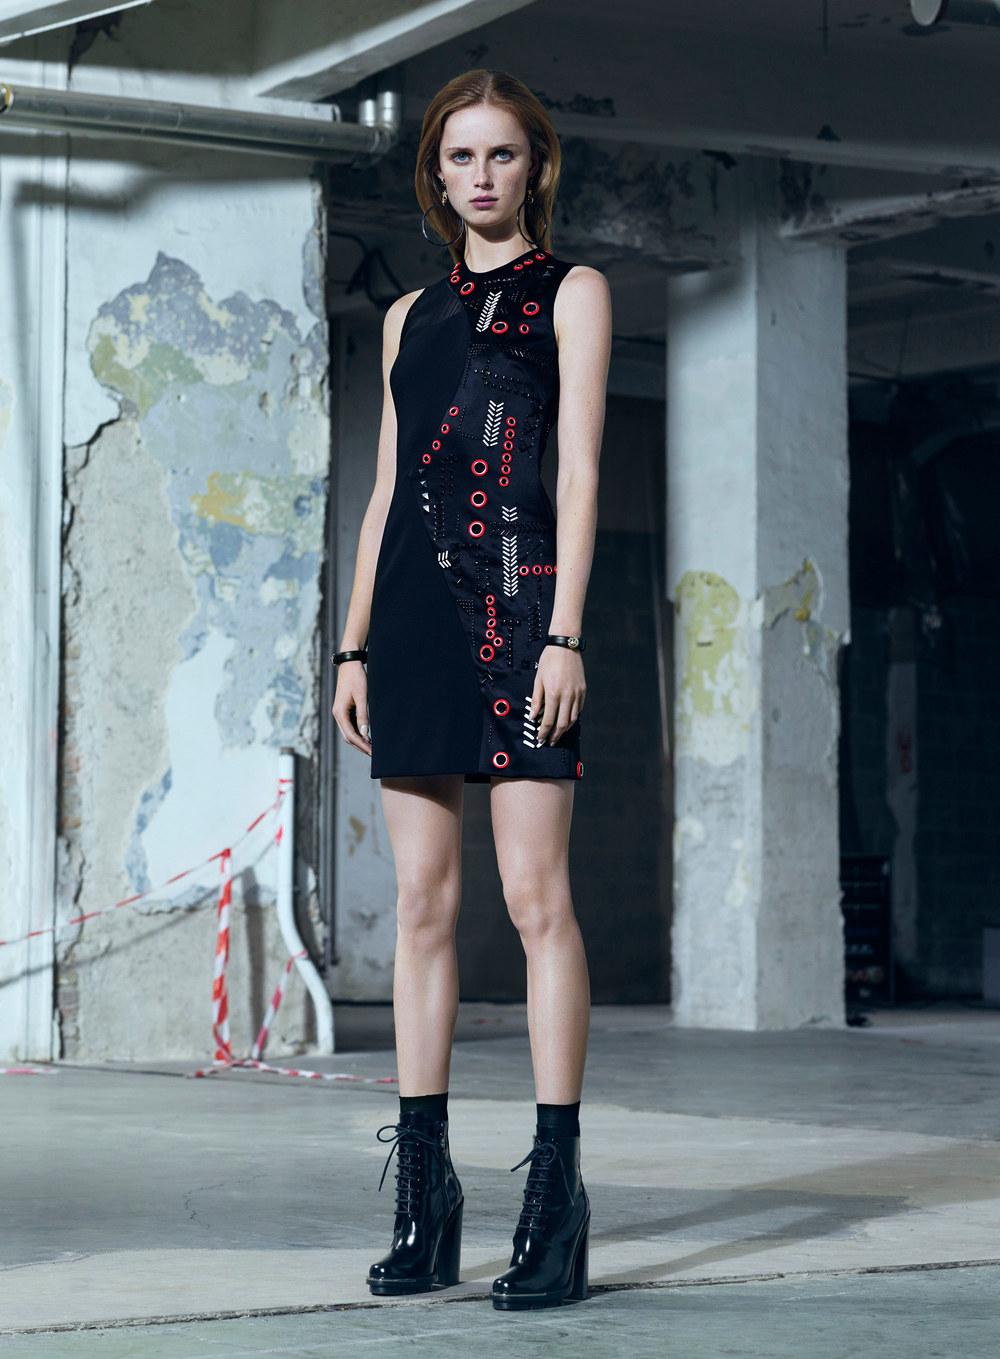 versace-pre-fall-2016-lookbook-18.jpg